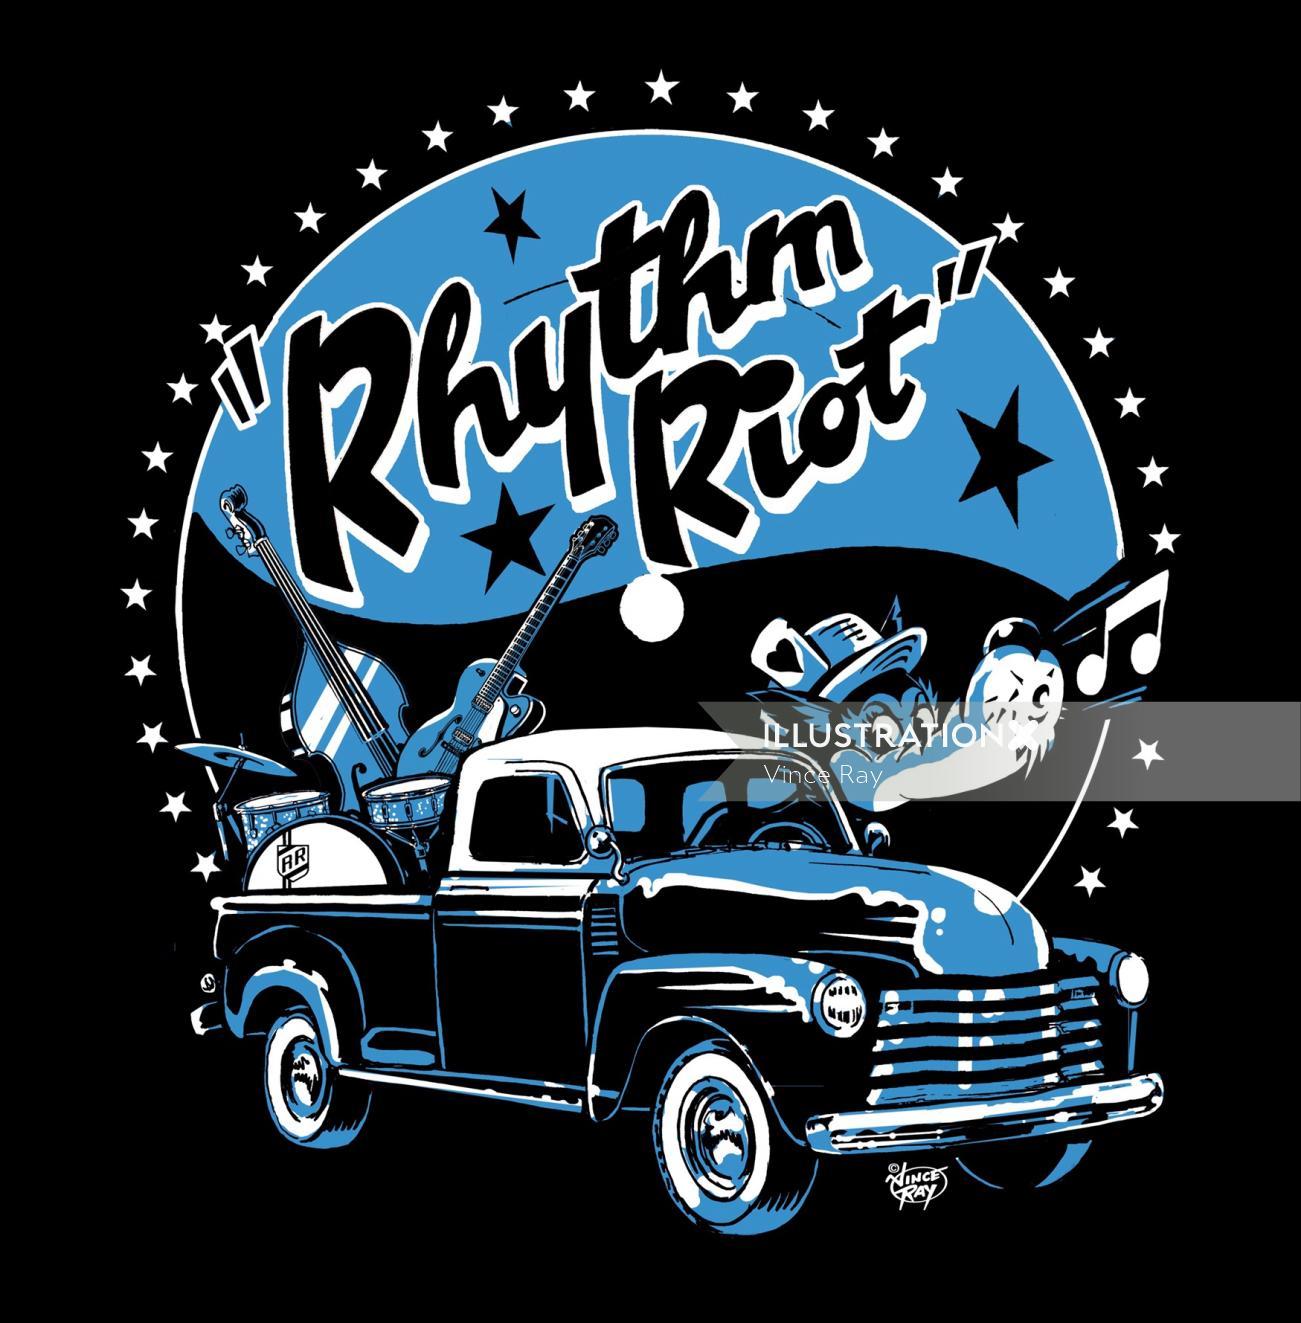 Graphic design of rhythm riot